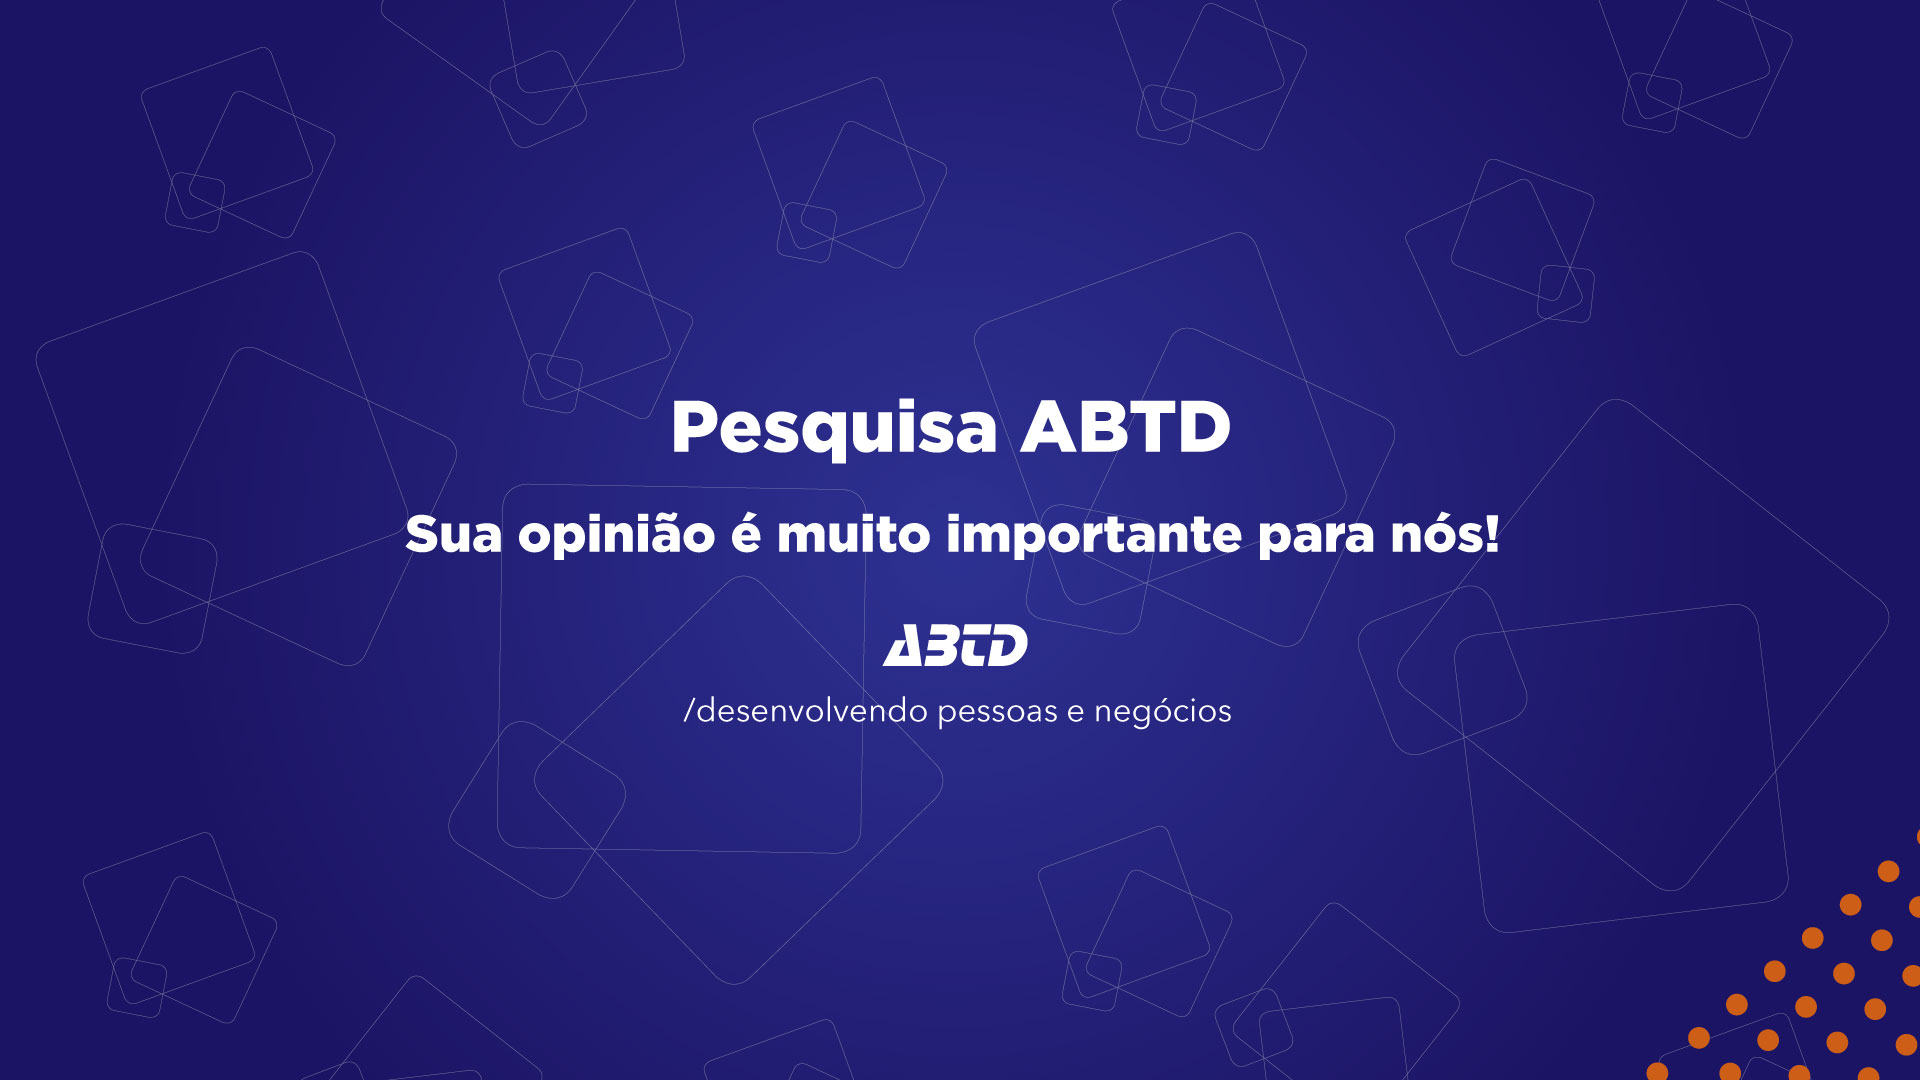 Pesquisa ABTD